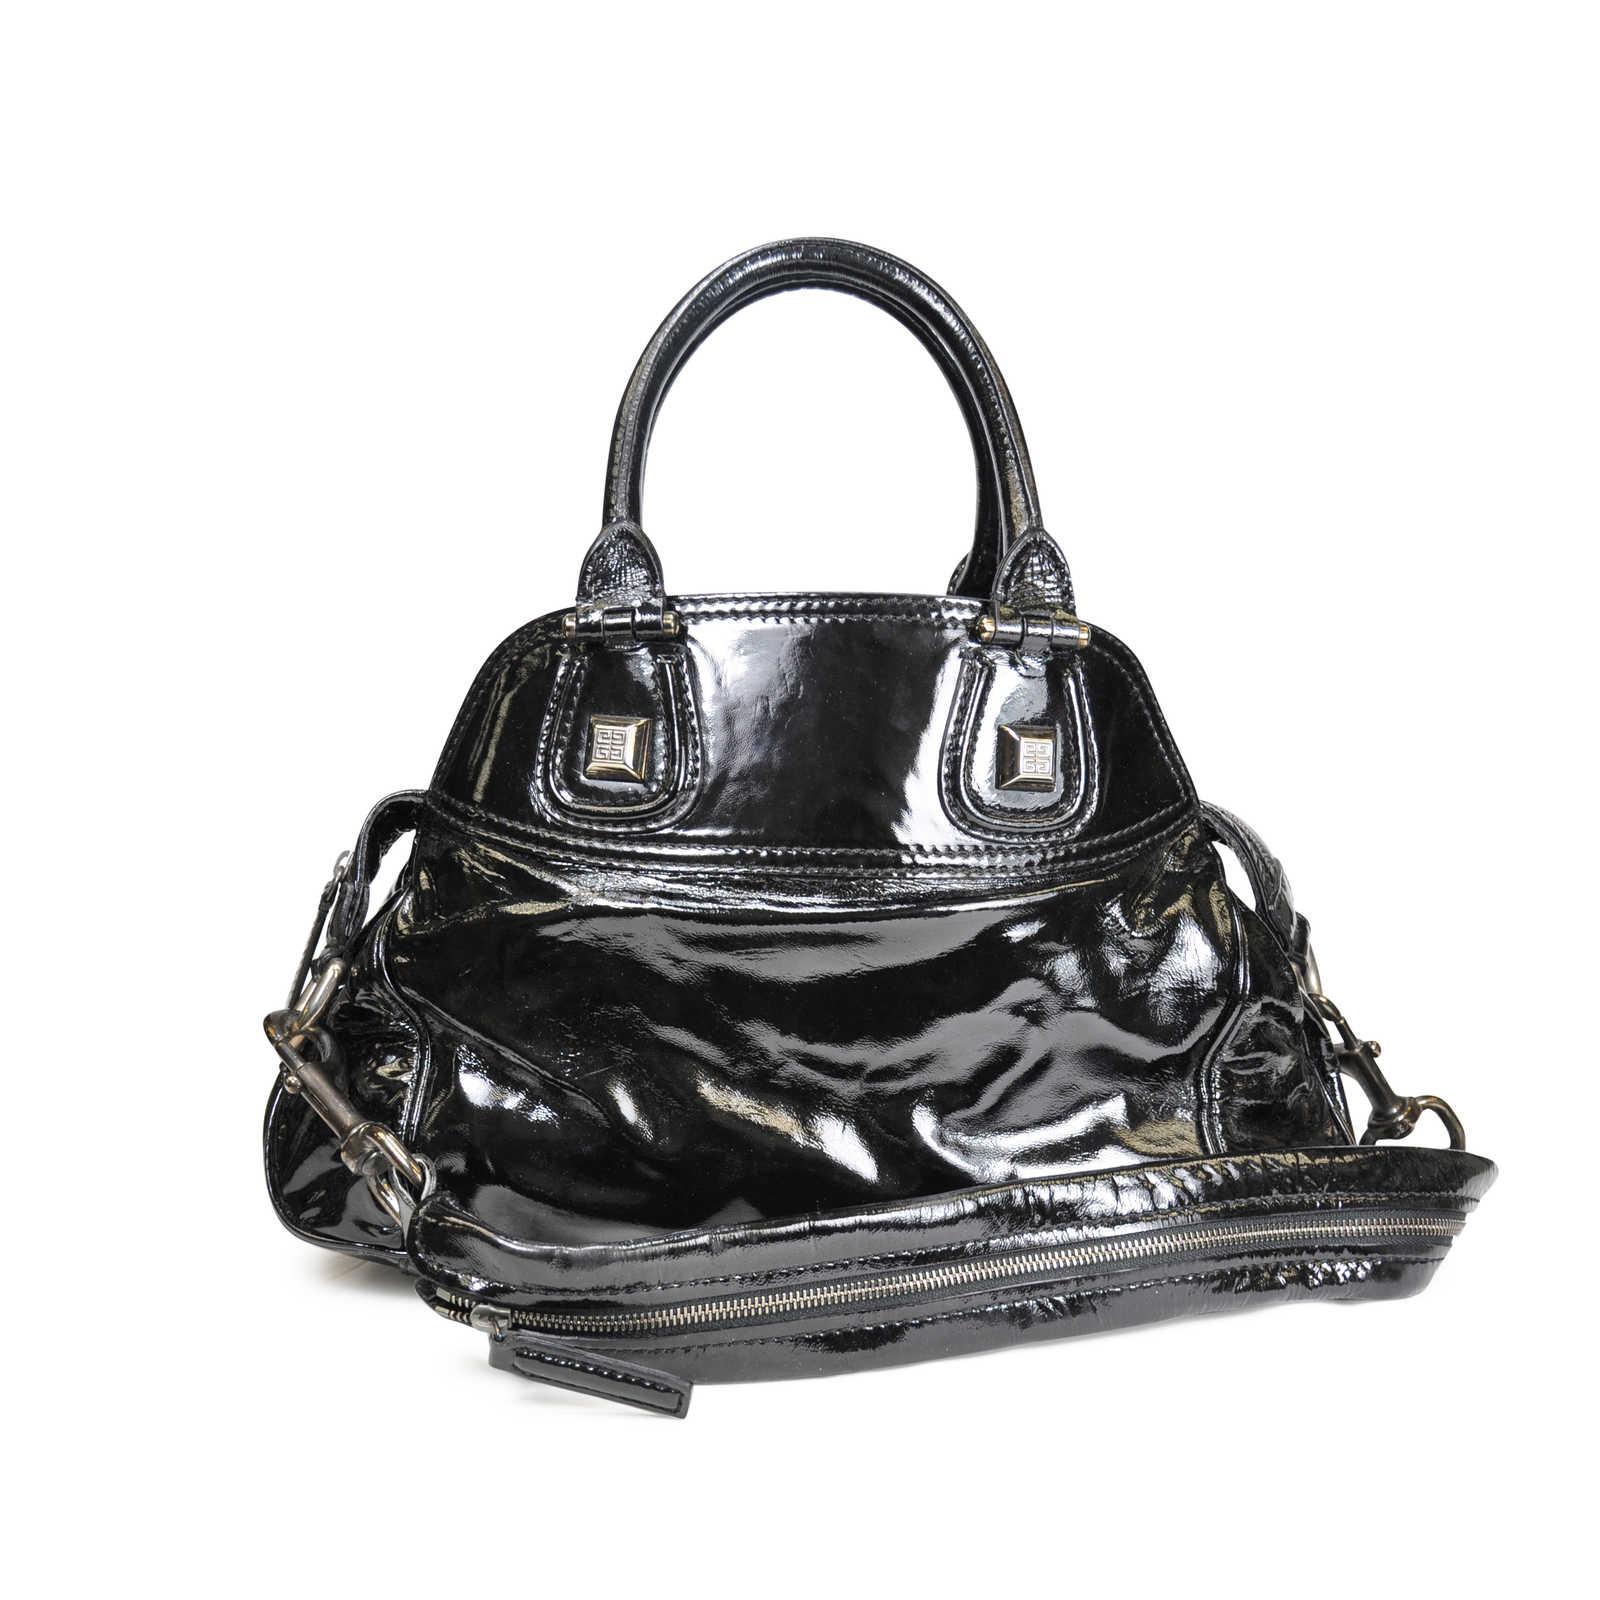 f1e59b527060 Givenchy Handbag Leather Lxrandco Pre Owned Luxury Vine